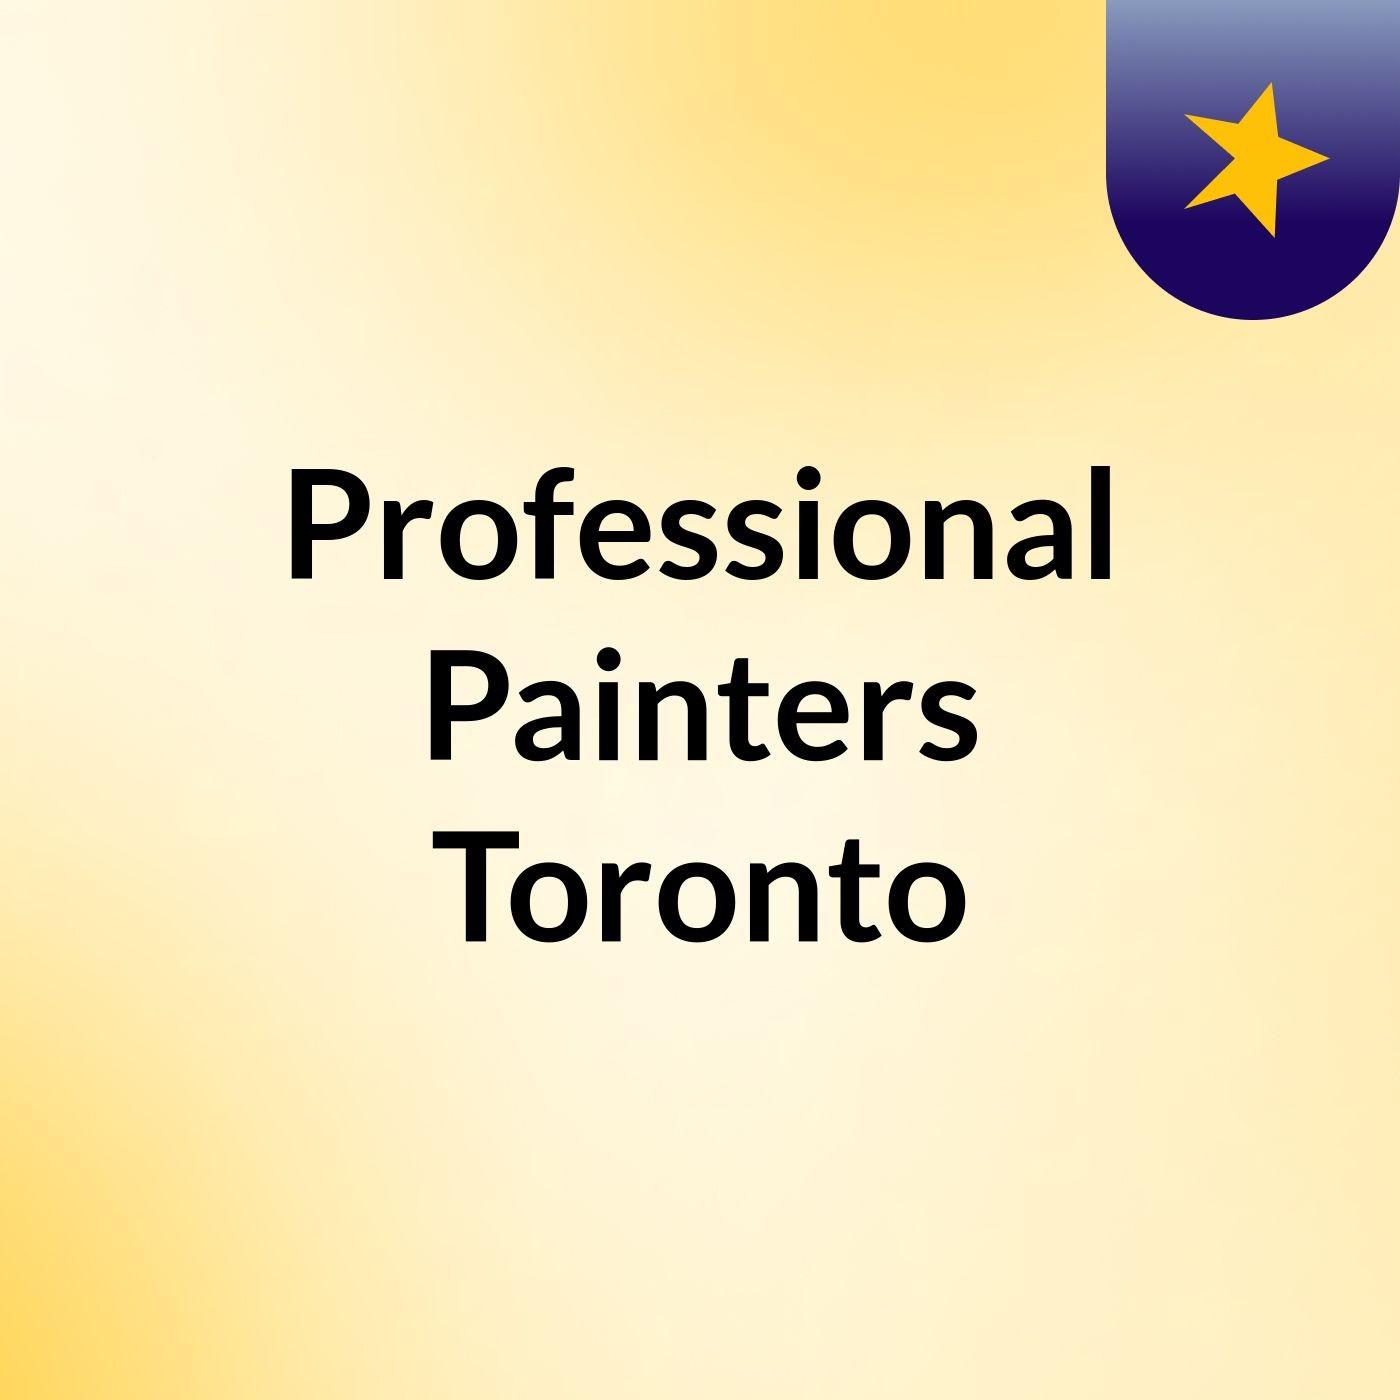 Professional Painters Toronto